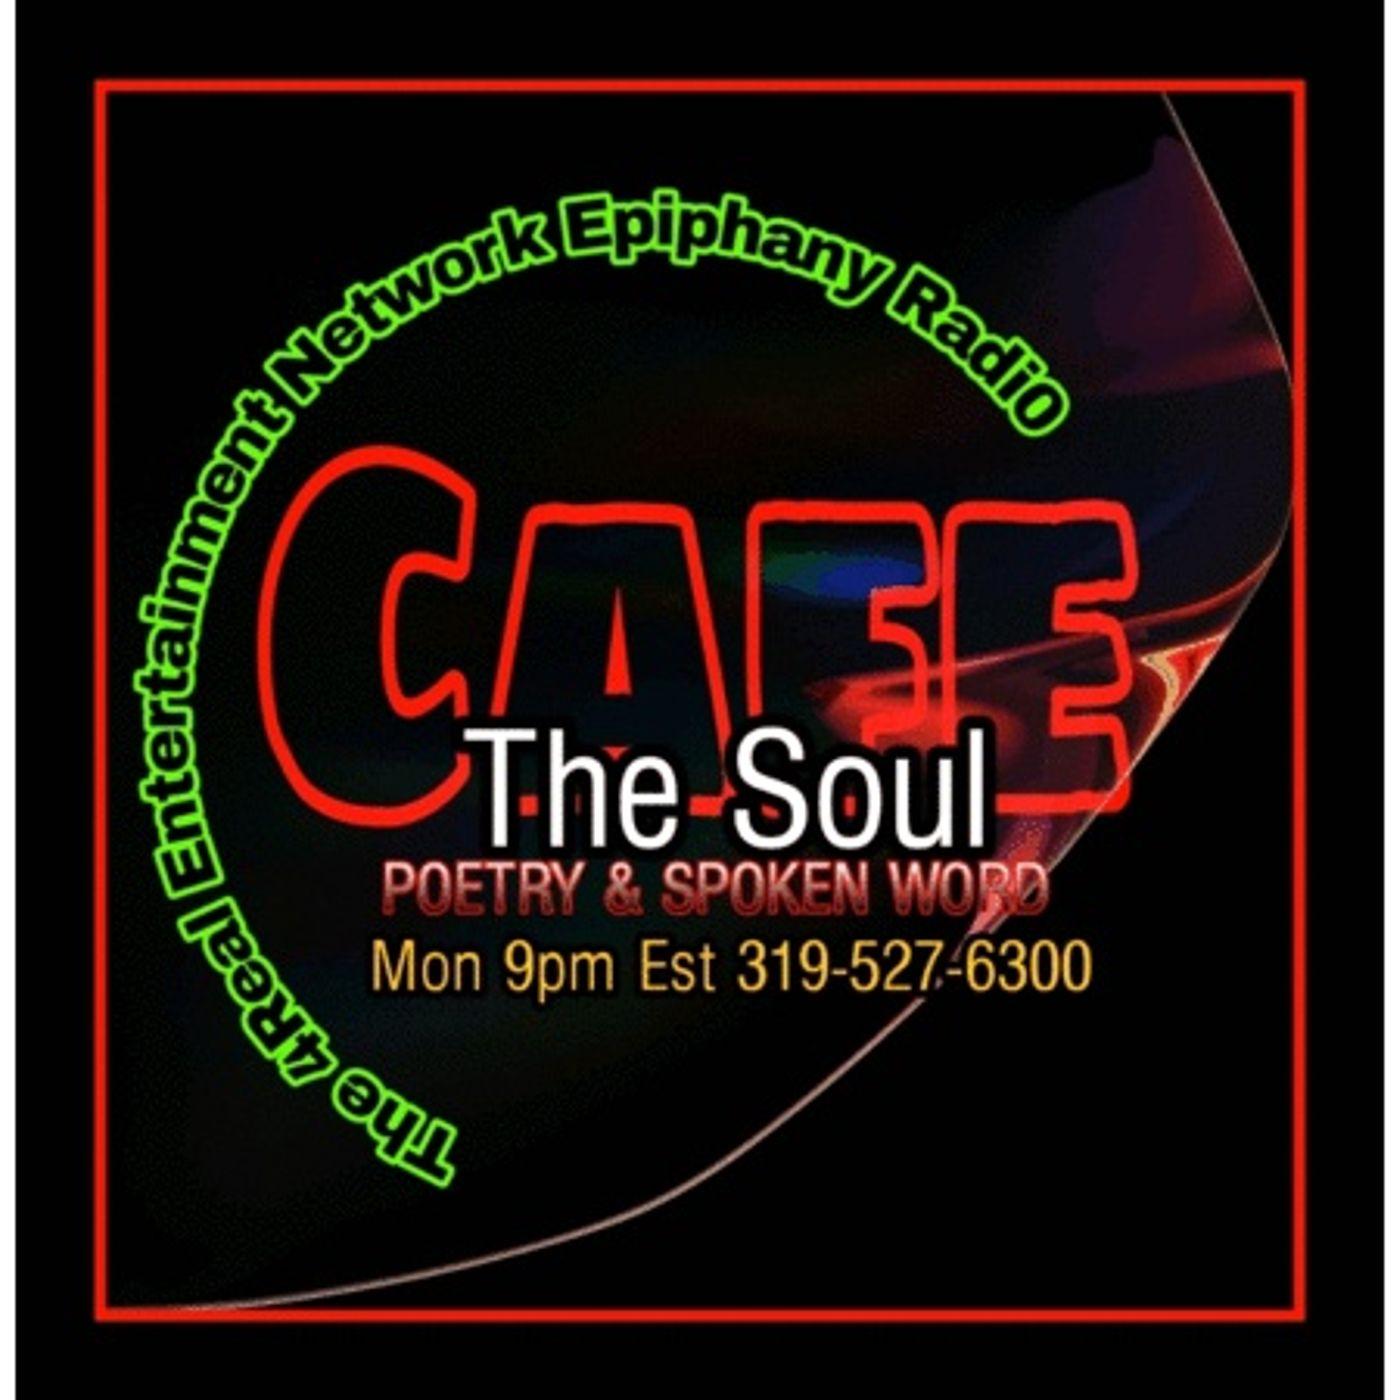 The Soul Cafe Let's Chill @Epiphany Radi0